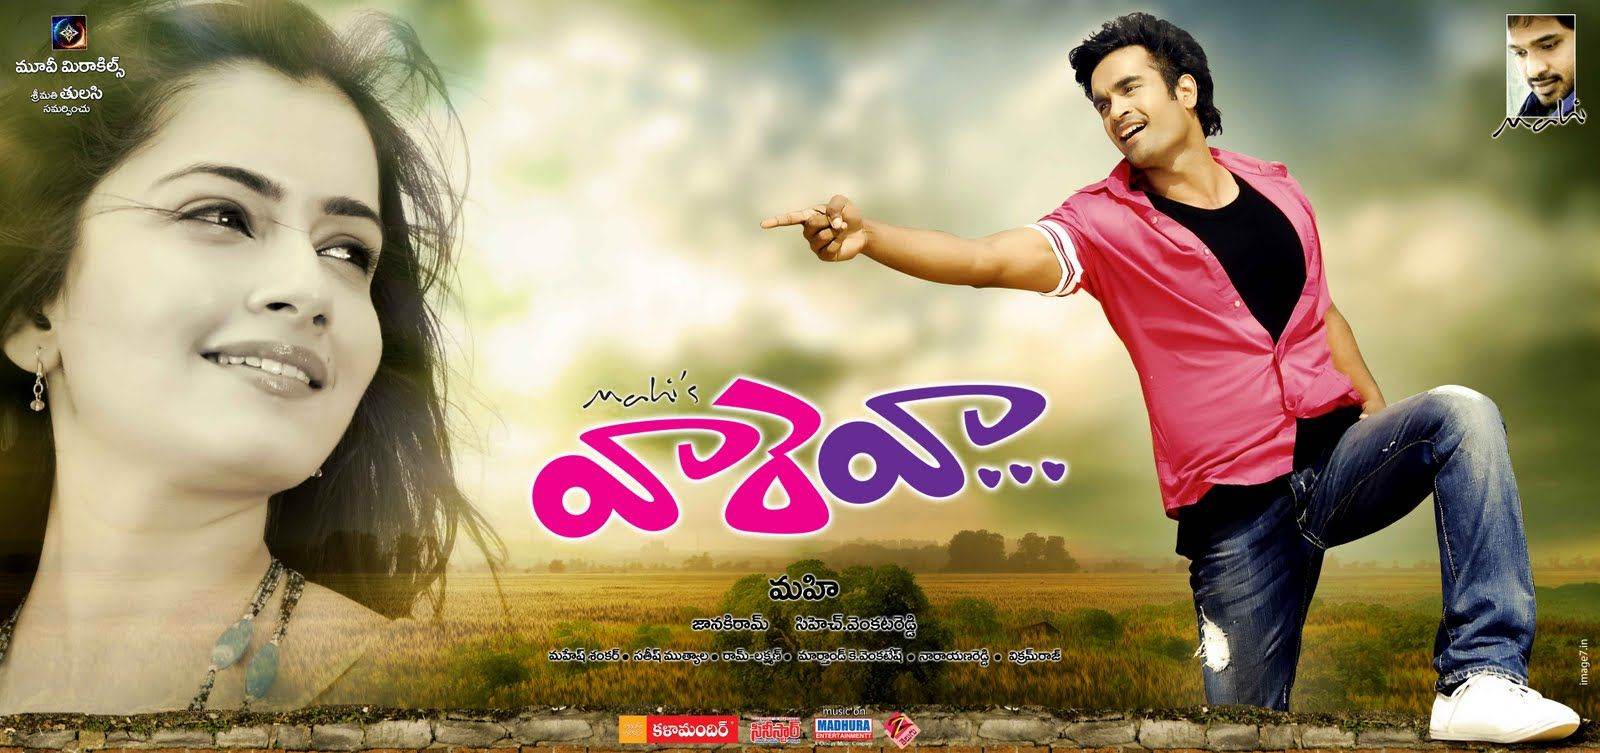 Movie Telugu Bgm